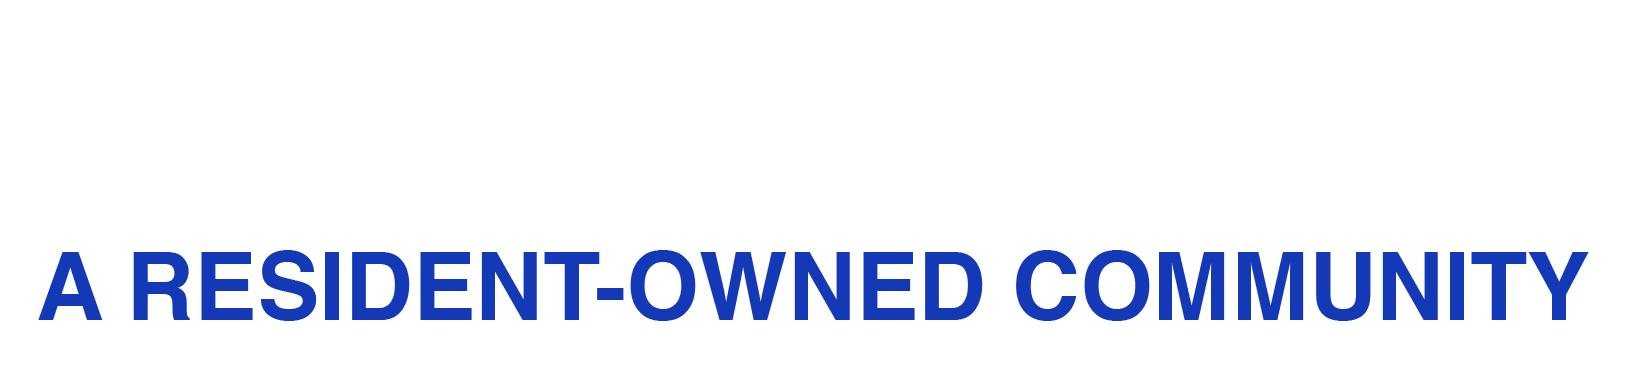 Meadowbrook Homeowners Association